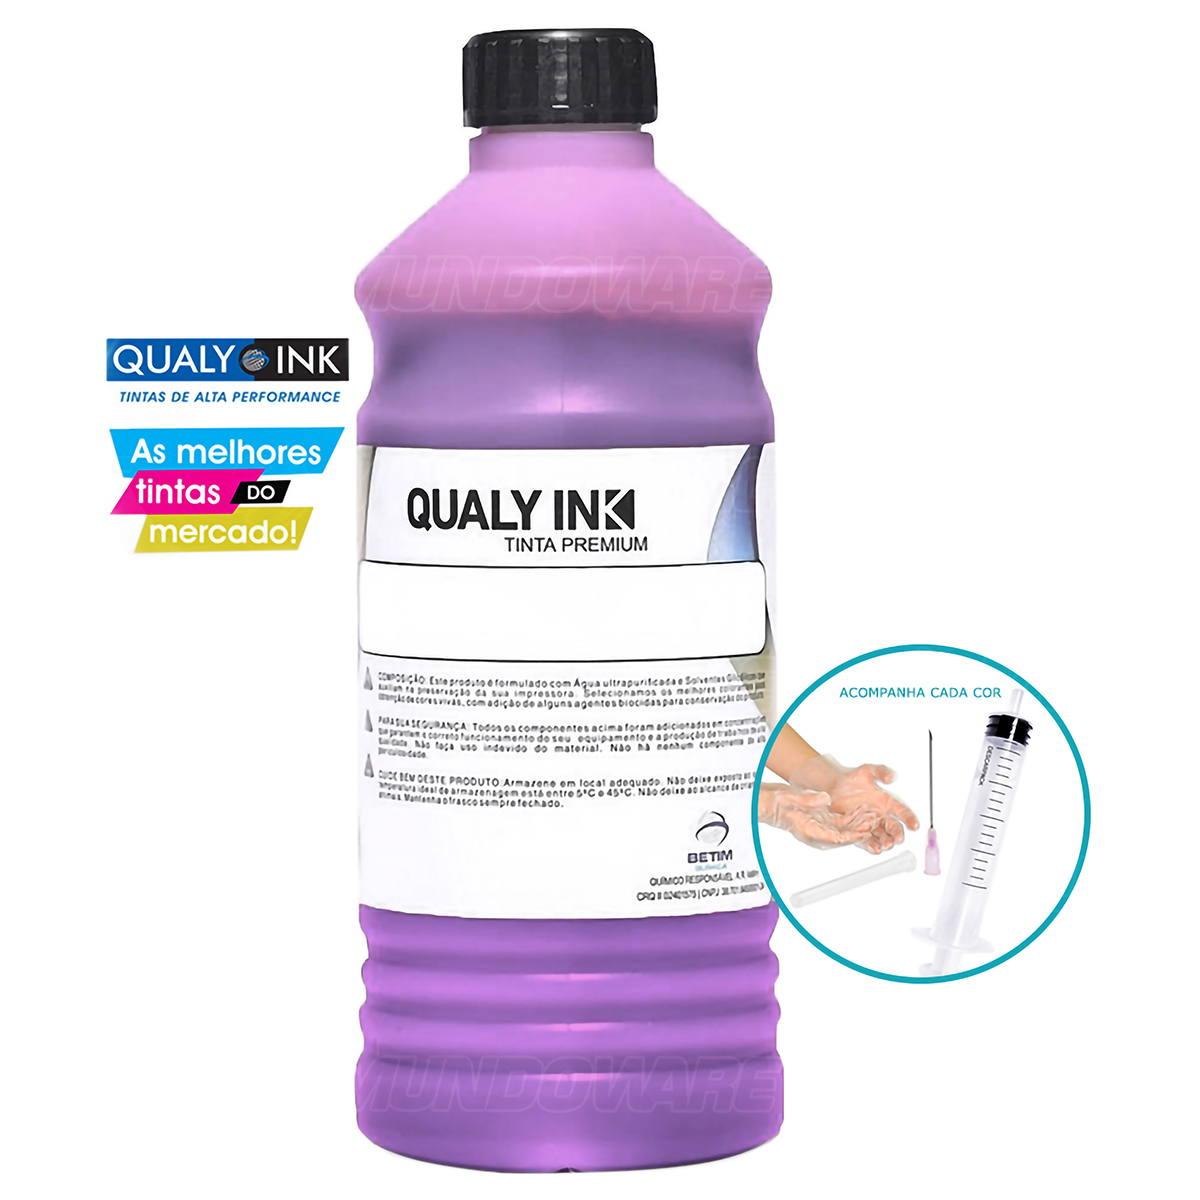 Tinta Corante Qualy-Ink Universal para Cartucho Bulk Ink e Tanque de Tinta Magenta Refil 1L